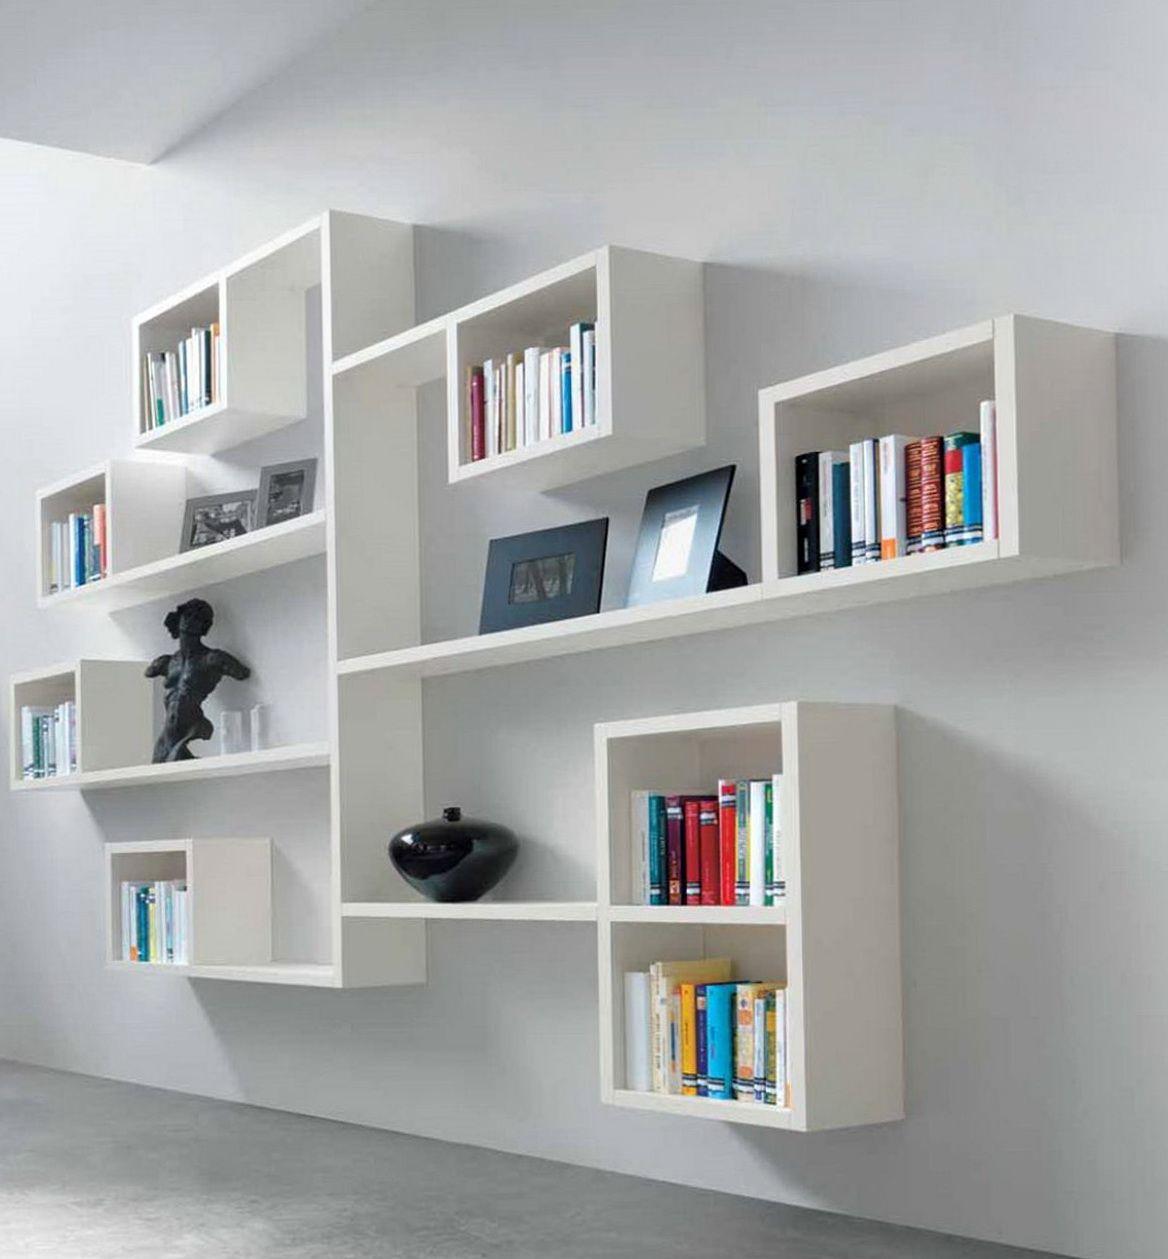 Ikea Floating Shelves Part - 49: Wall Shelves For Books Ikea